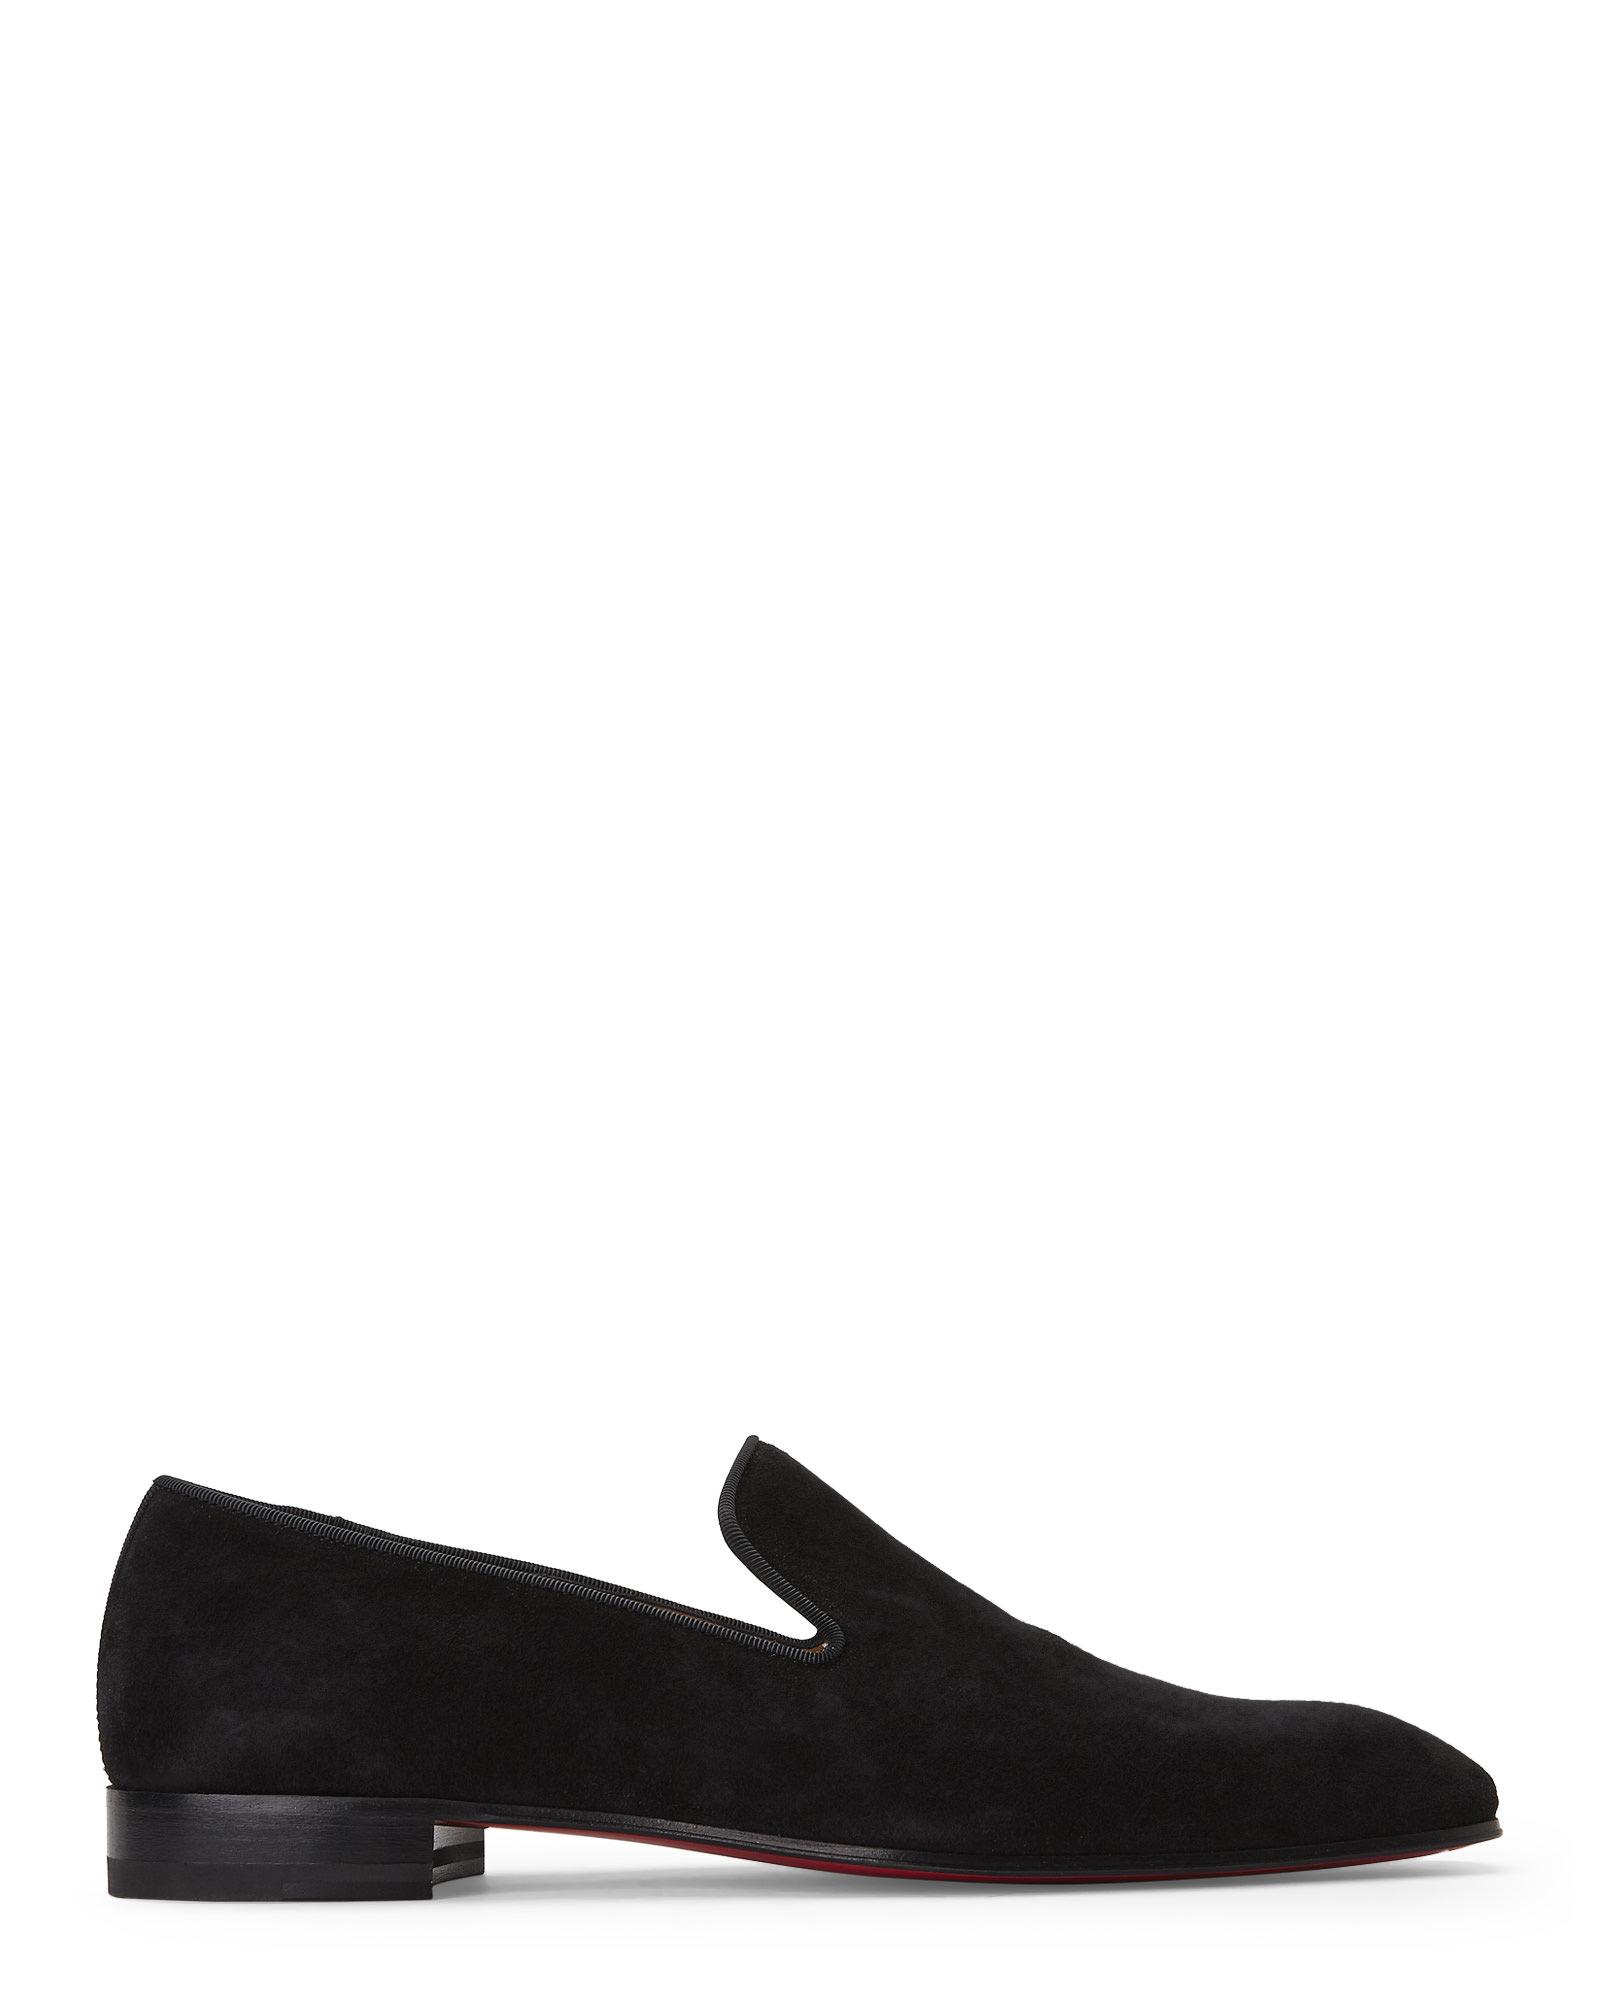 Christian louboutin Black Dandelion Smoking Loafers in Black for ...